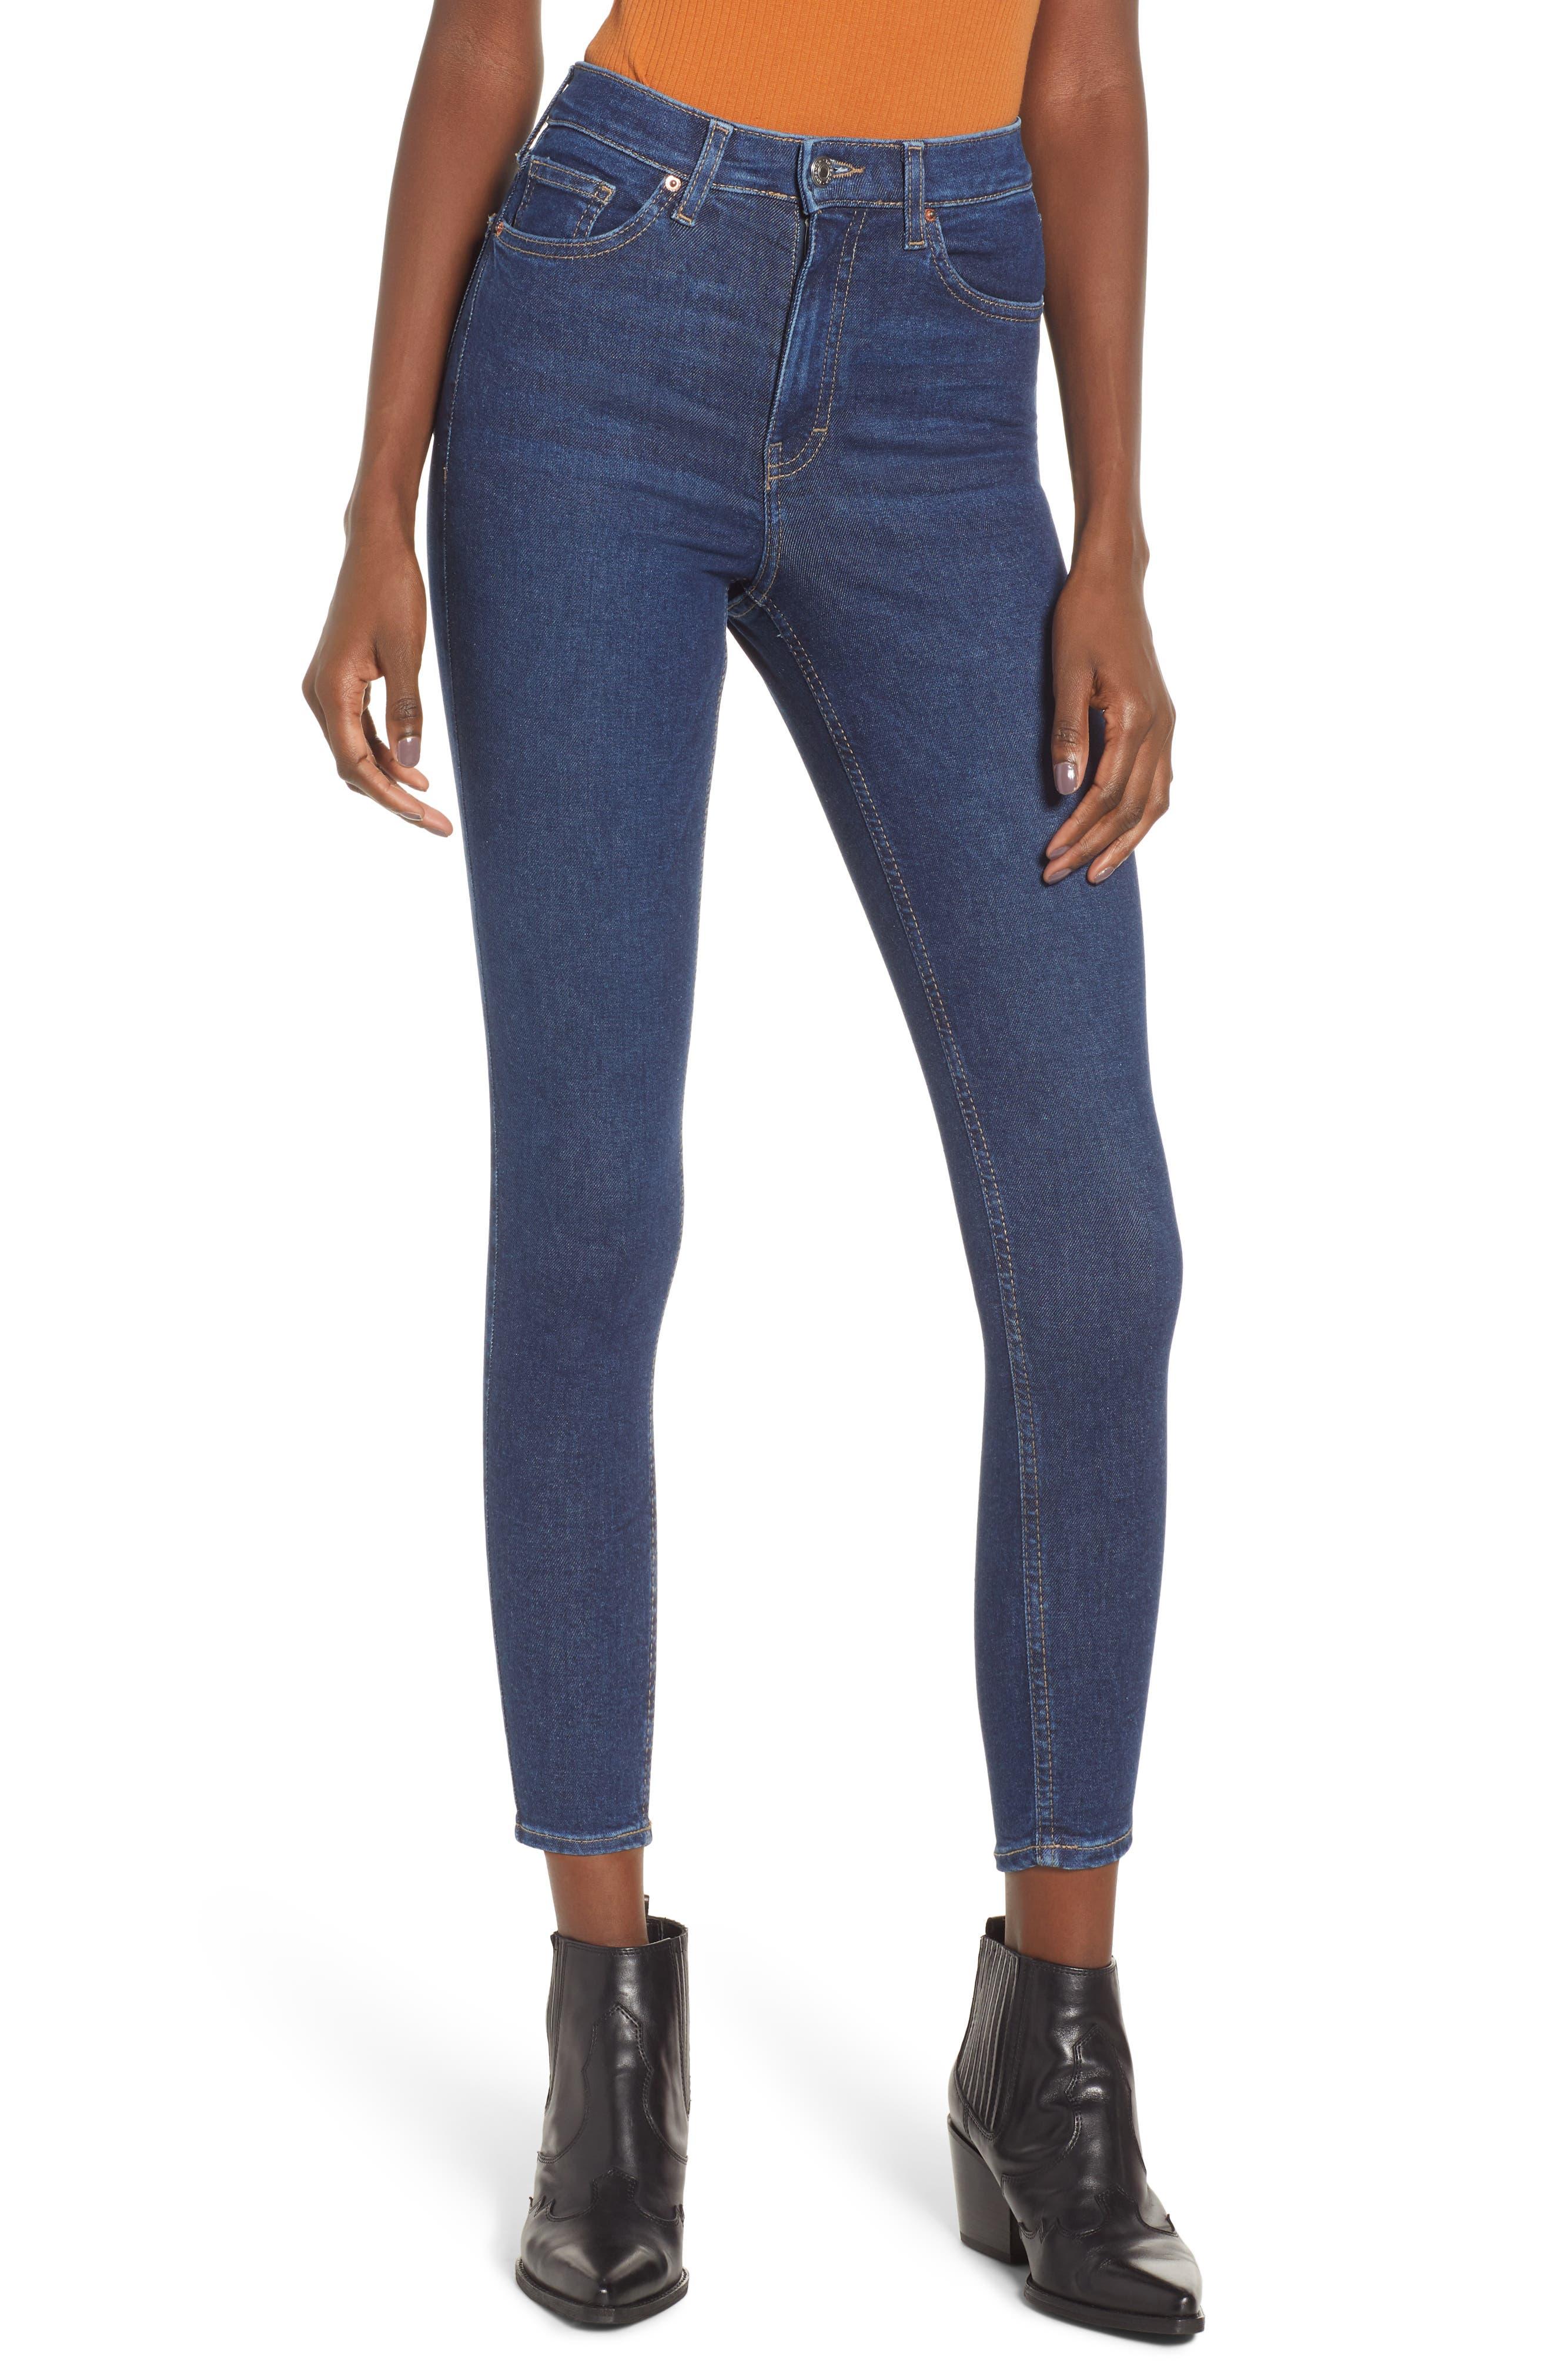 MOTO Jamie High Waist Skinny Jeans,                             Main thumbnail 1, color,                             INDIGO